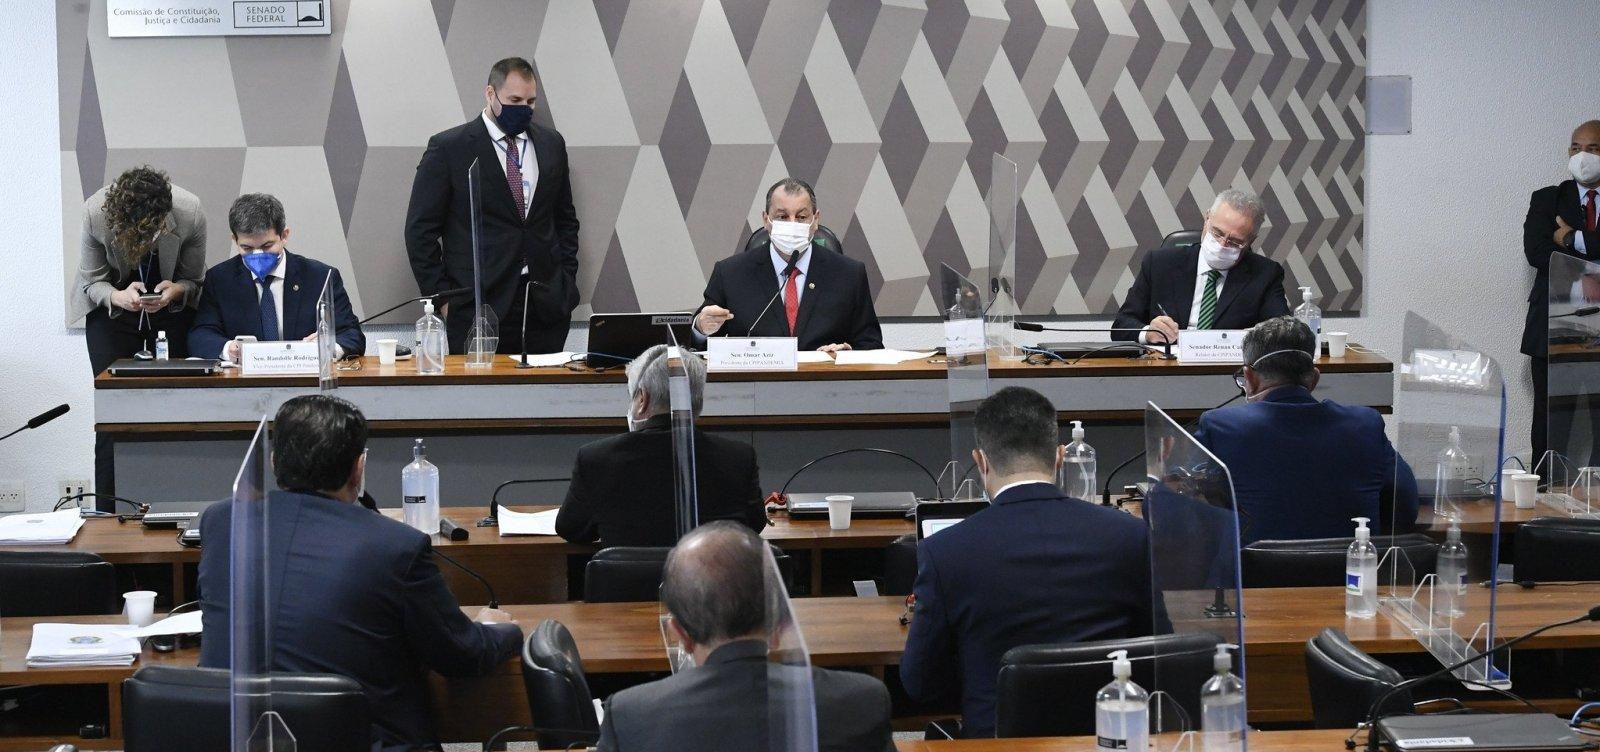 CPI aprova quebra de sigilos de Pazuello, Ernesto Araújo e assessores